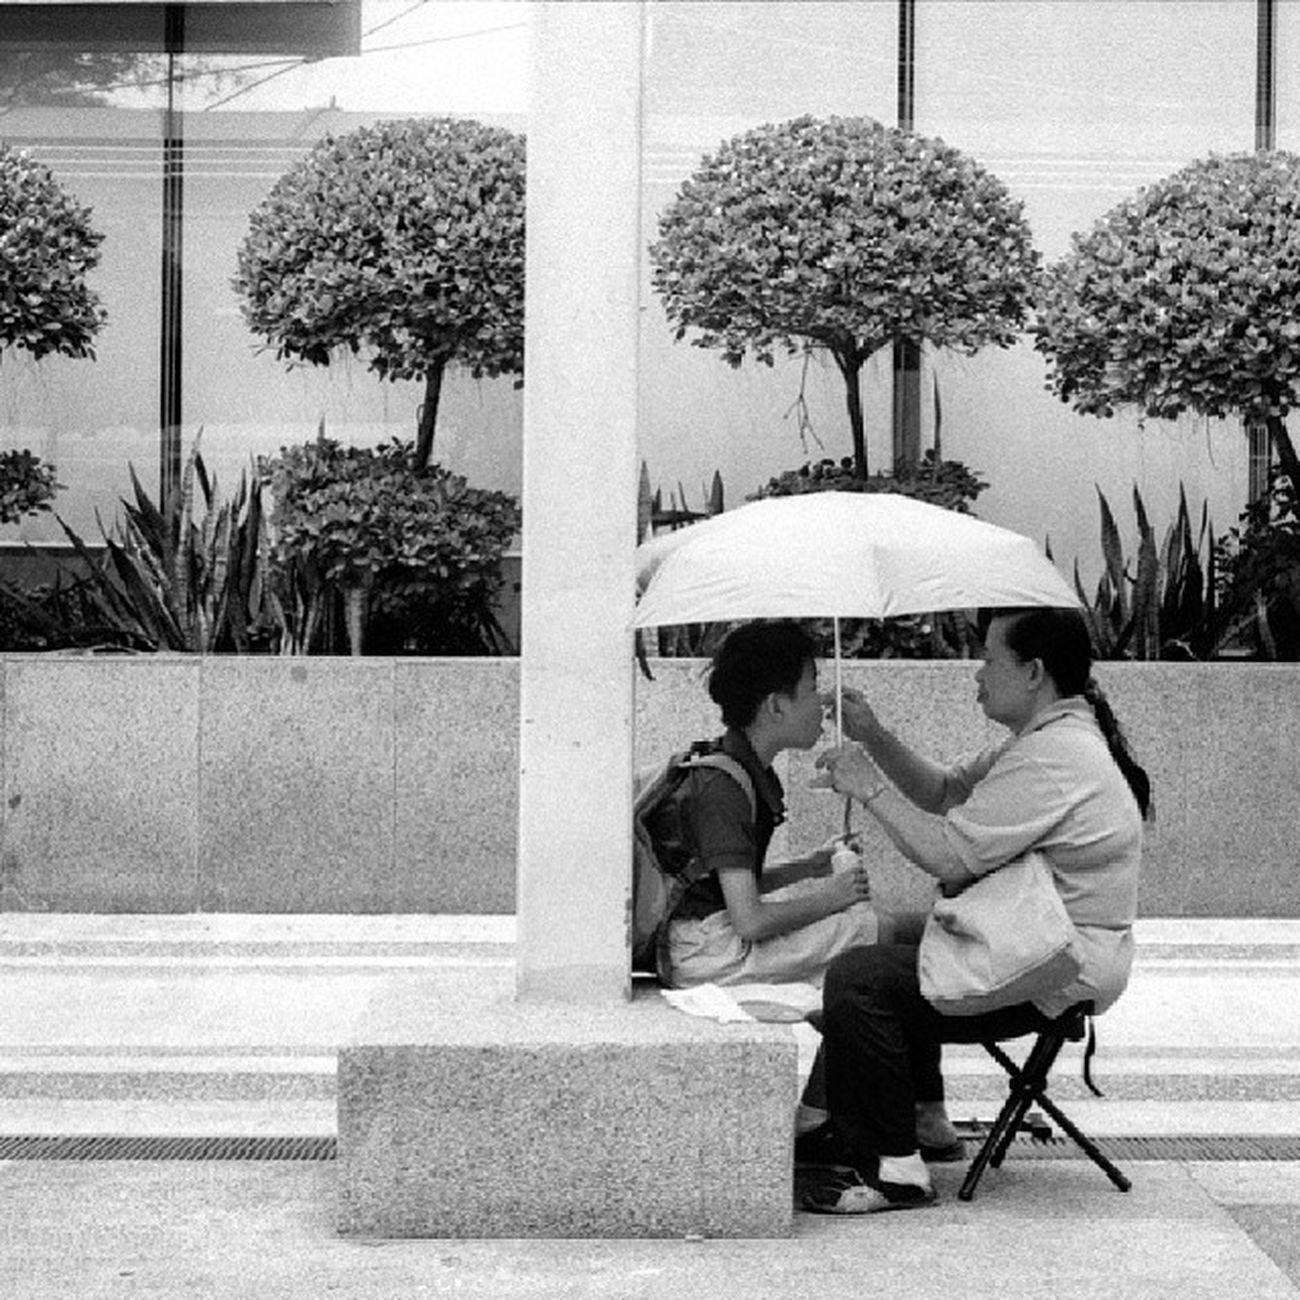 #sgig #igsg #instasg #ishootfilm #buyfilmnotmegapixels #sgstreetscene #blackandwhite #monochrome #bw #leica #trix #bw_society #wearejuxt #sg50 #love #mother Sg50 Sgstreetscene Blackandwhite Love Mother Leica WeAreJuxt Monochrome Bw Bw_society Ishootfilm Igsg Instasg Sgig Trix Buyfilmnotmegapixels